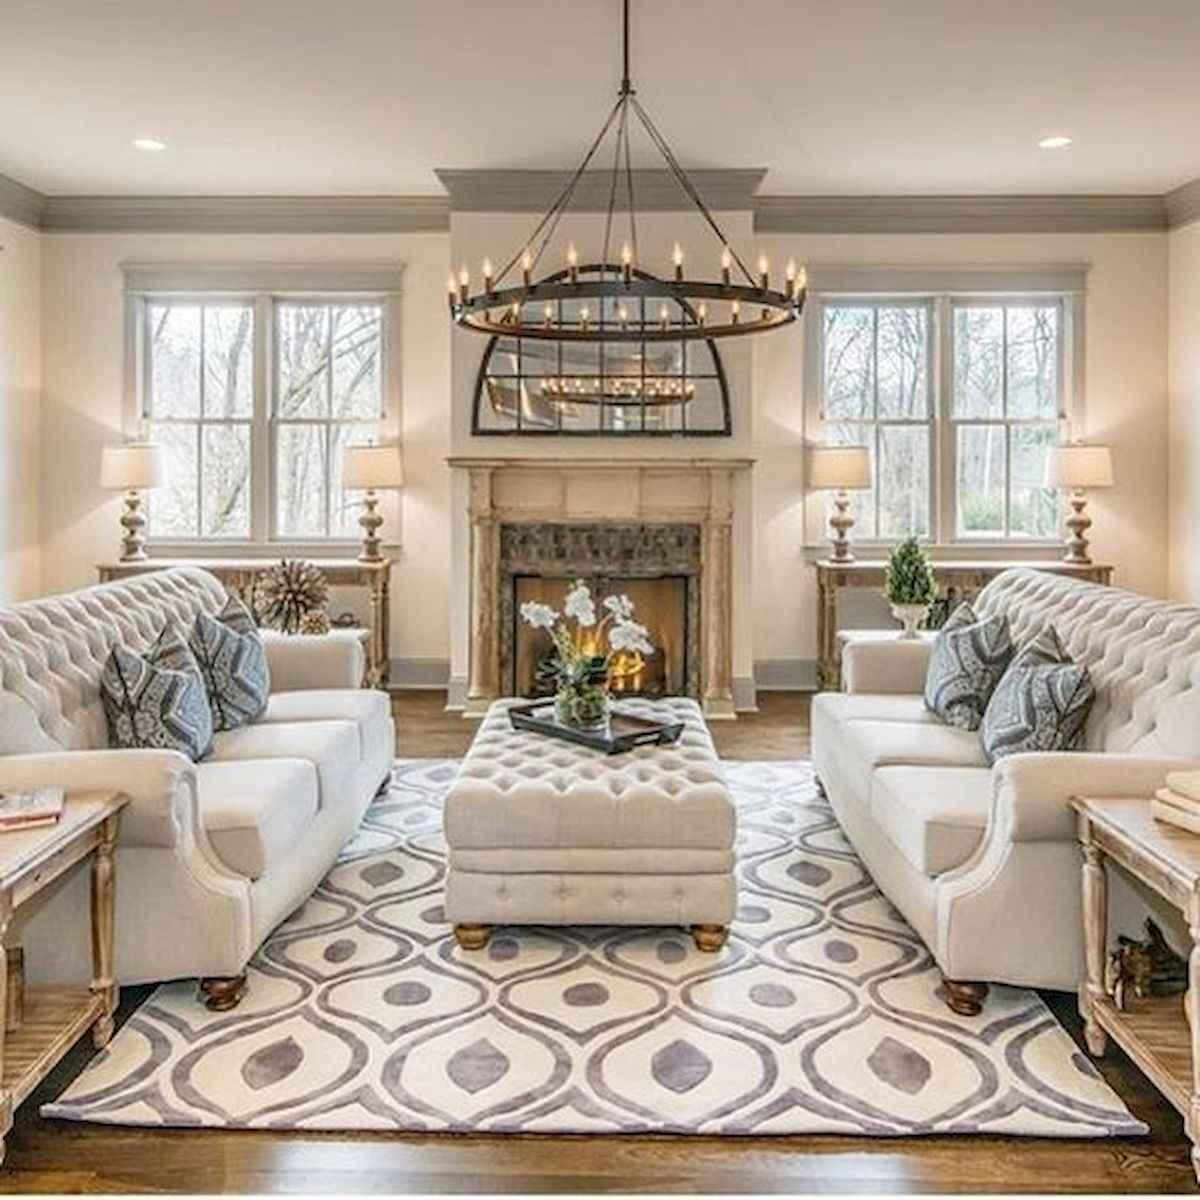 30 Stunning Farmhouse Living Room Decor Ideas (7)